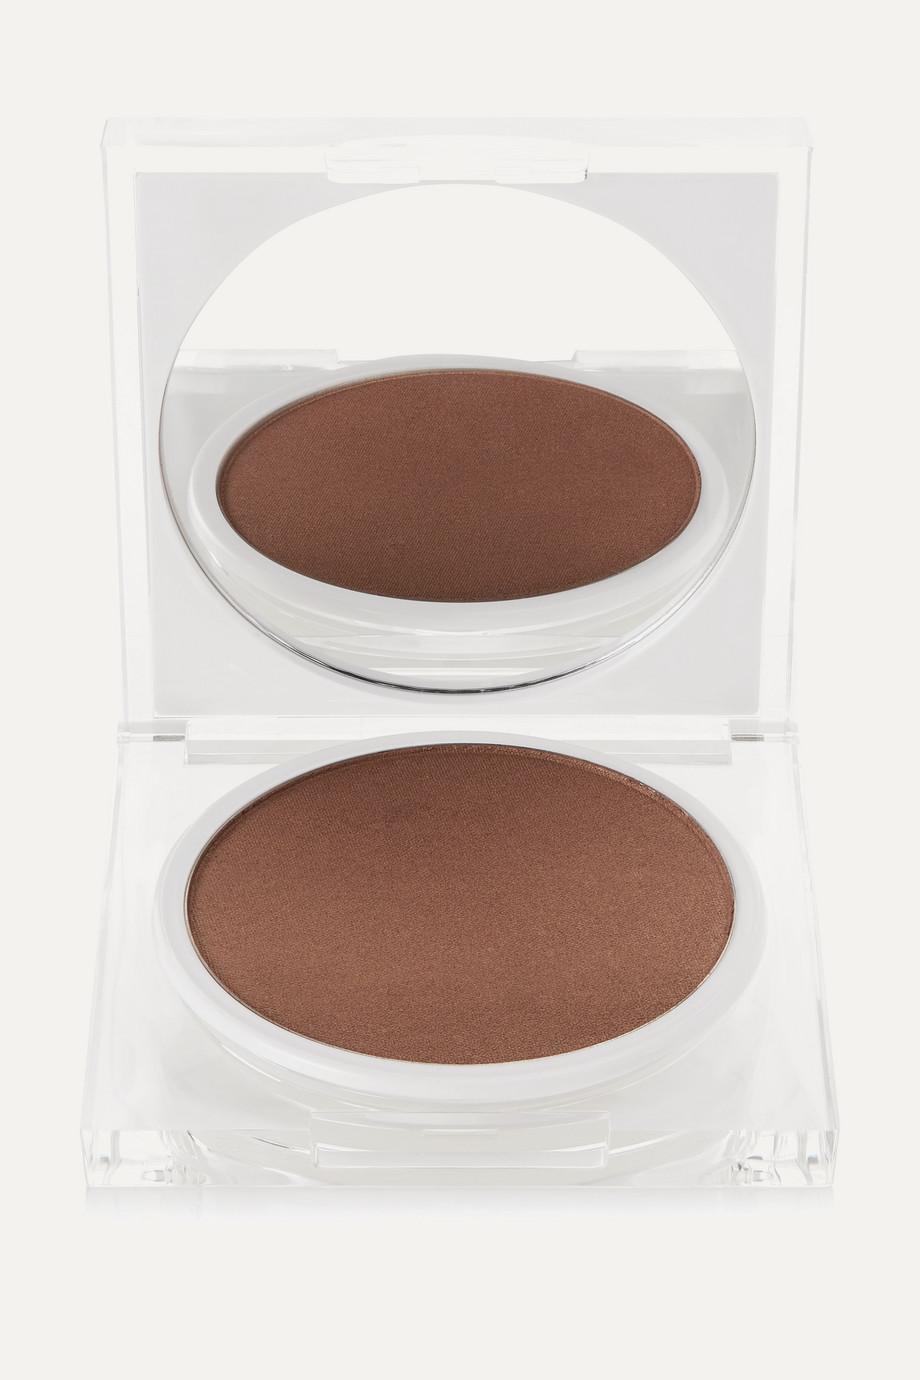 RMS Beauty Luminizing Powder – Madeira – Bronzer